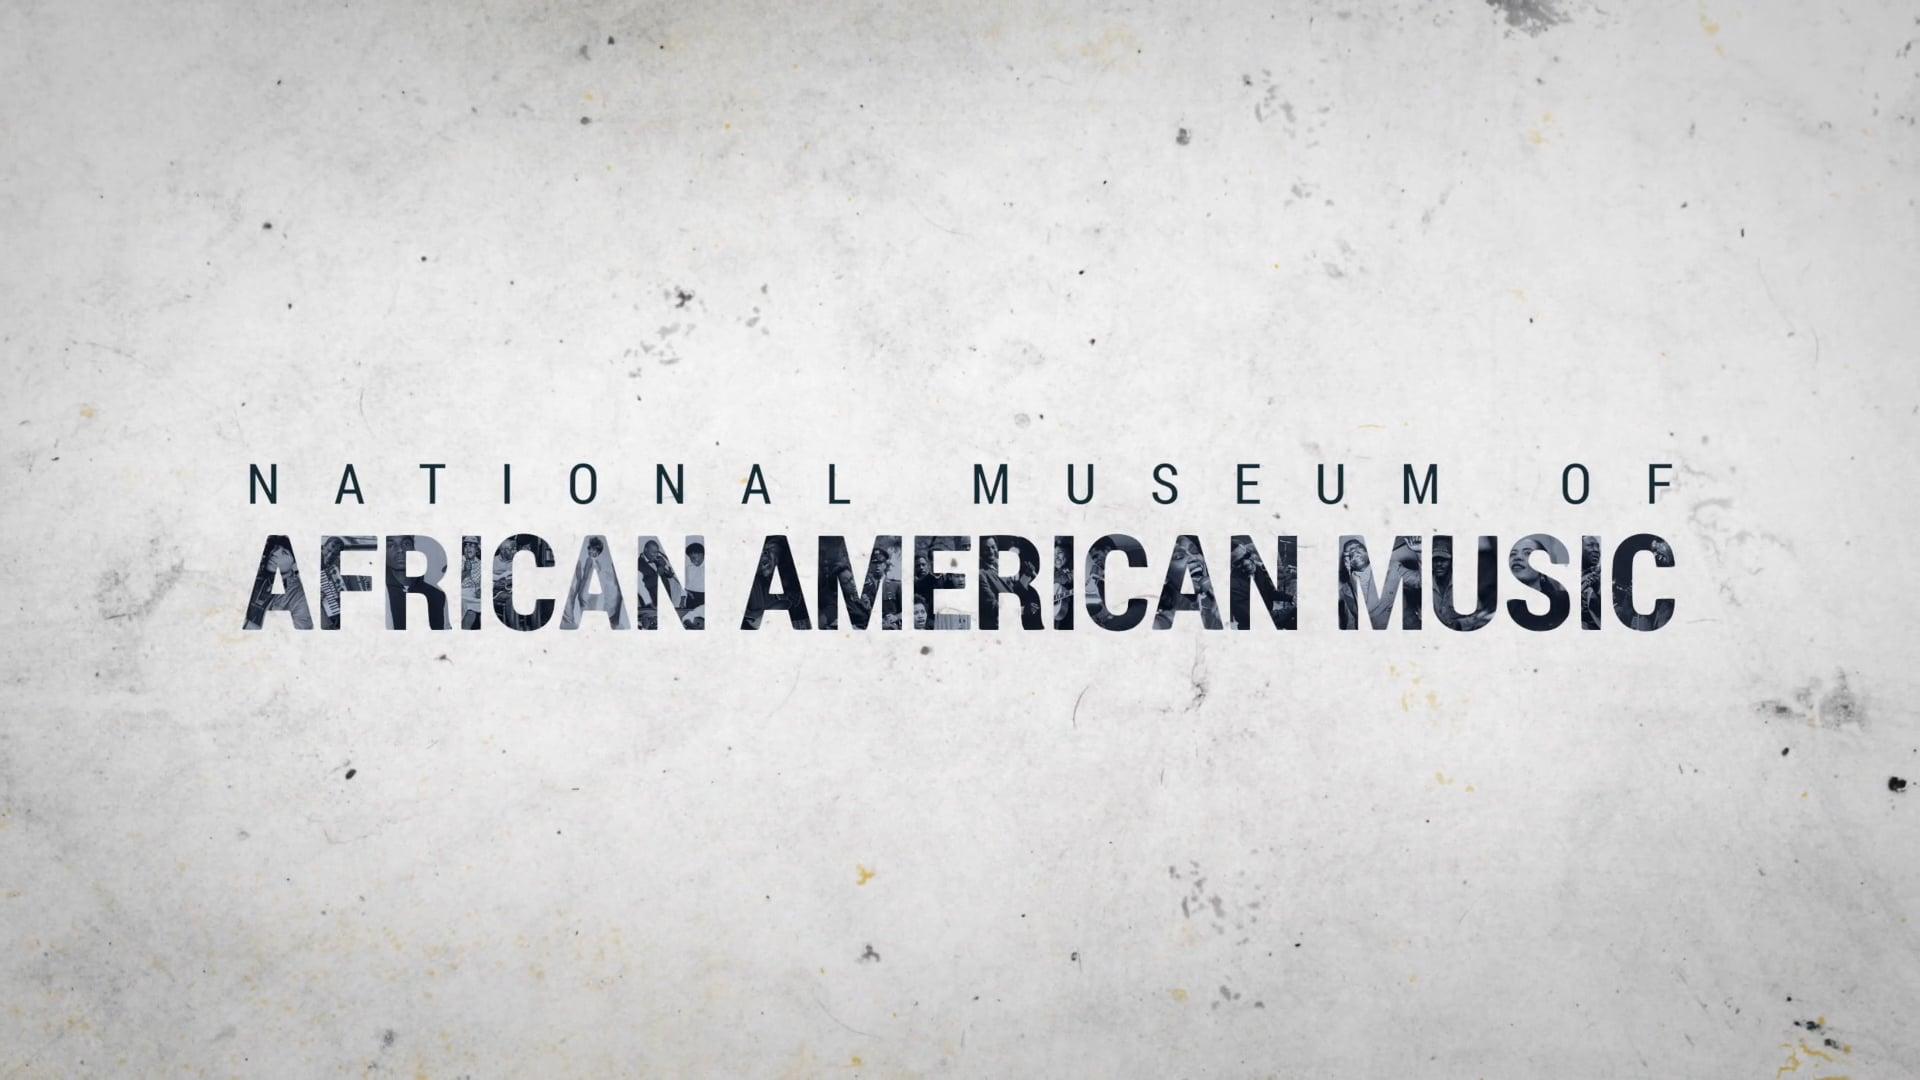 African American News, African American History, Black History, African American Music, KOLUMN Magazine, KOLUMN